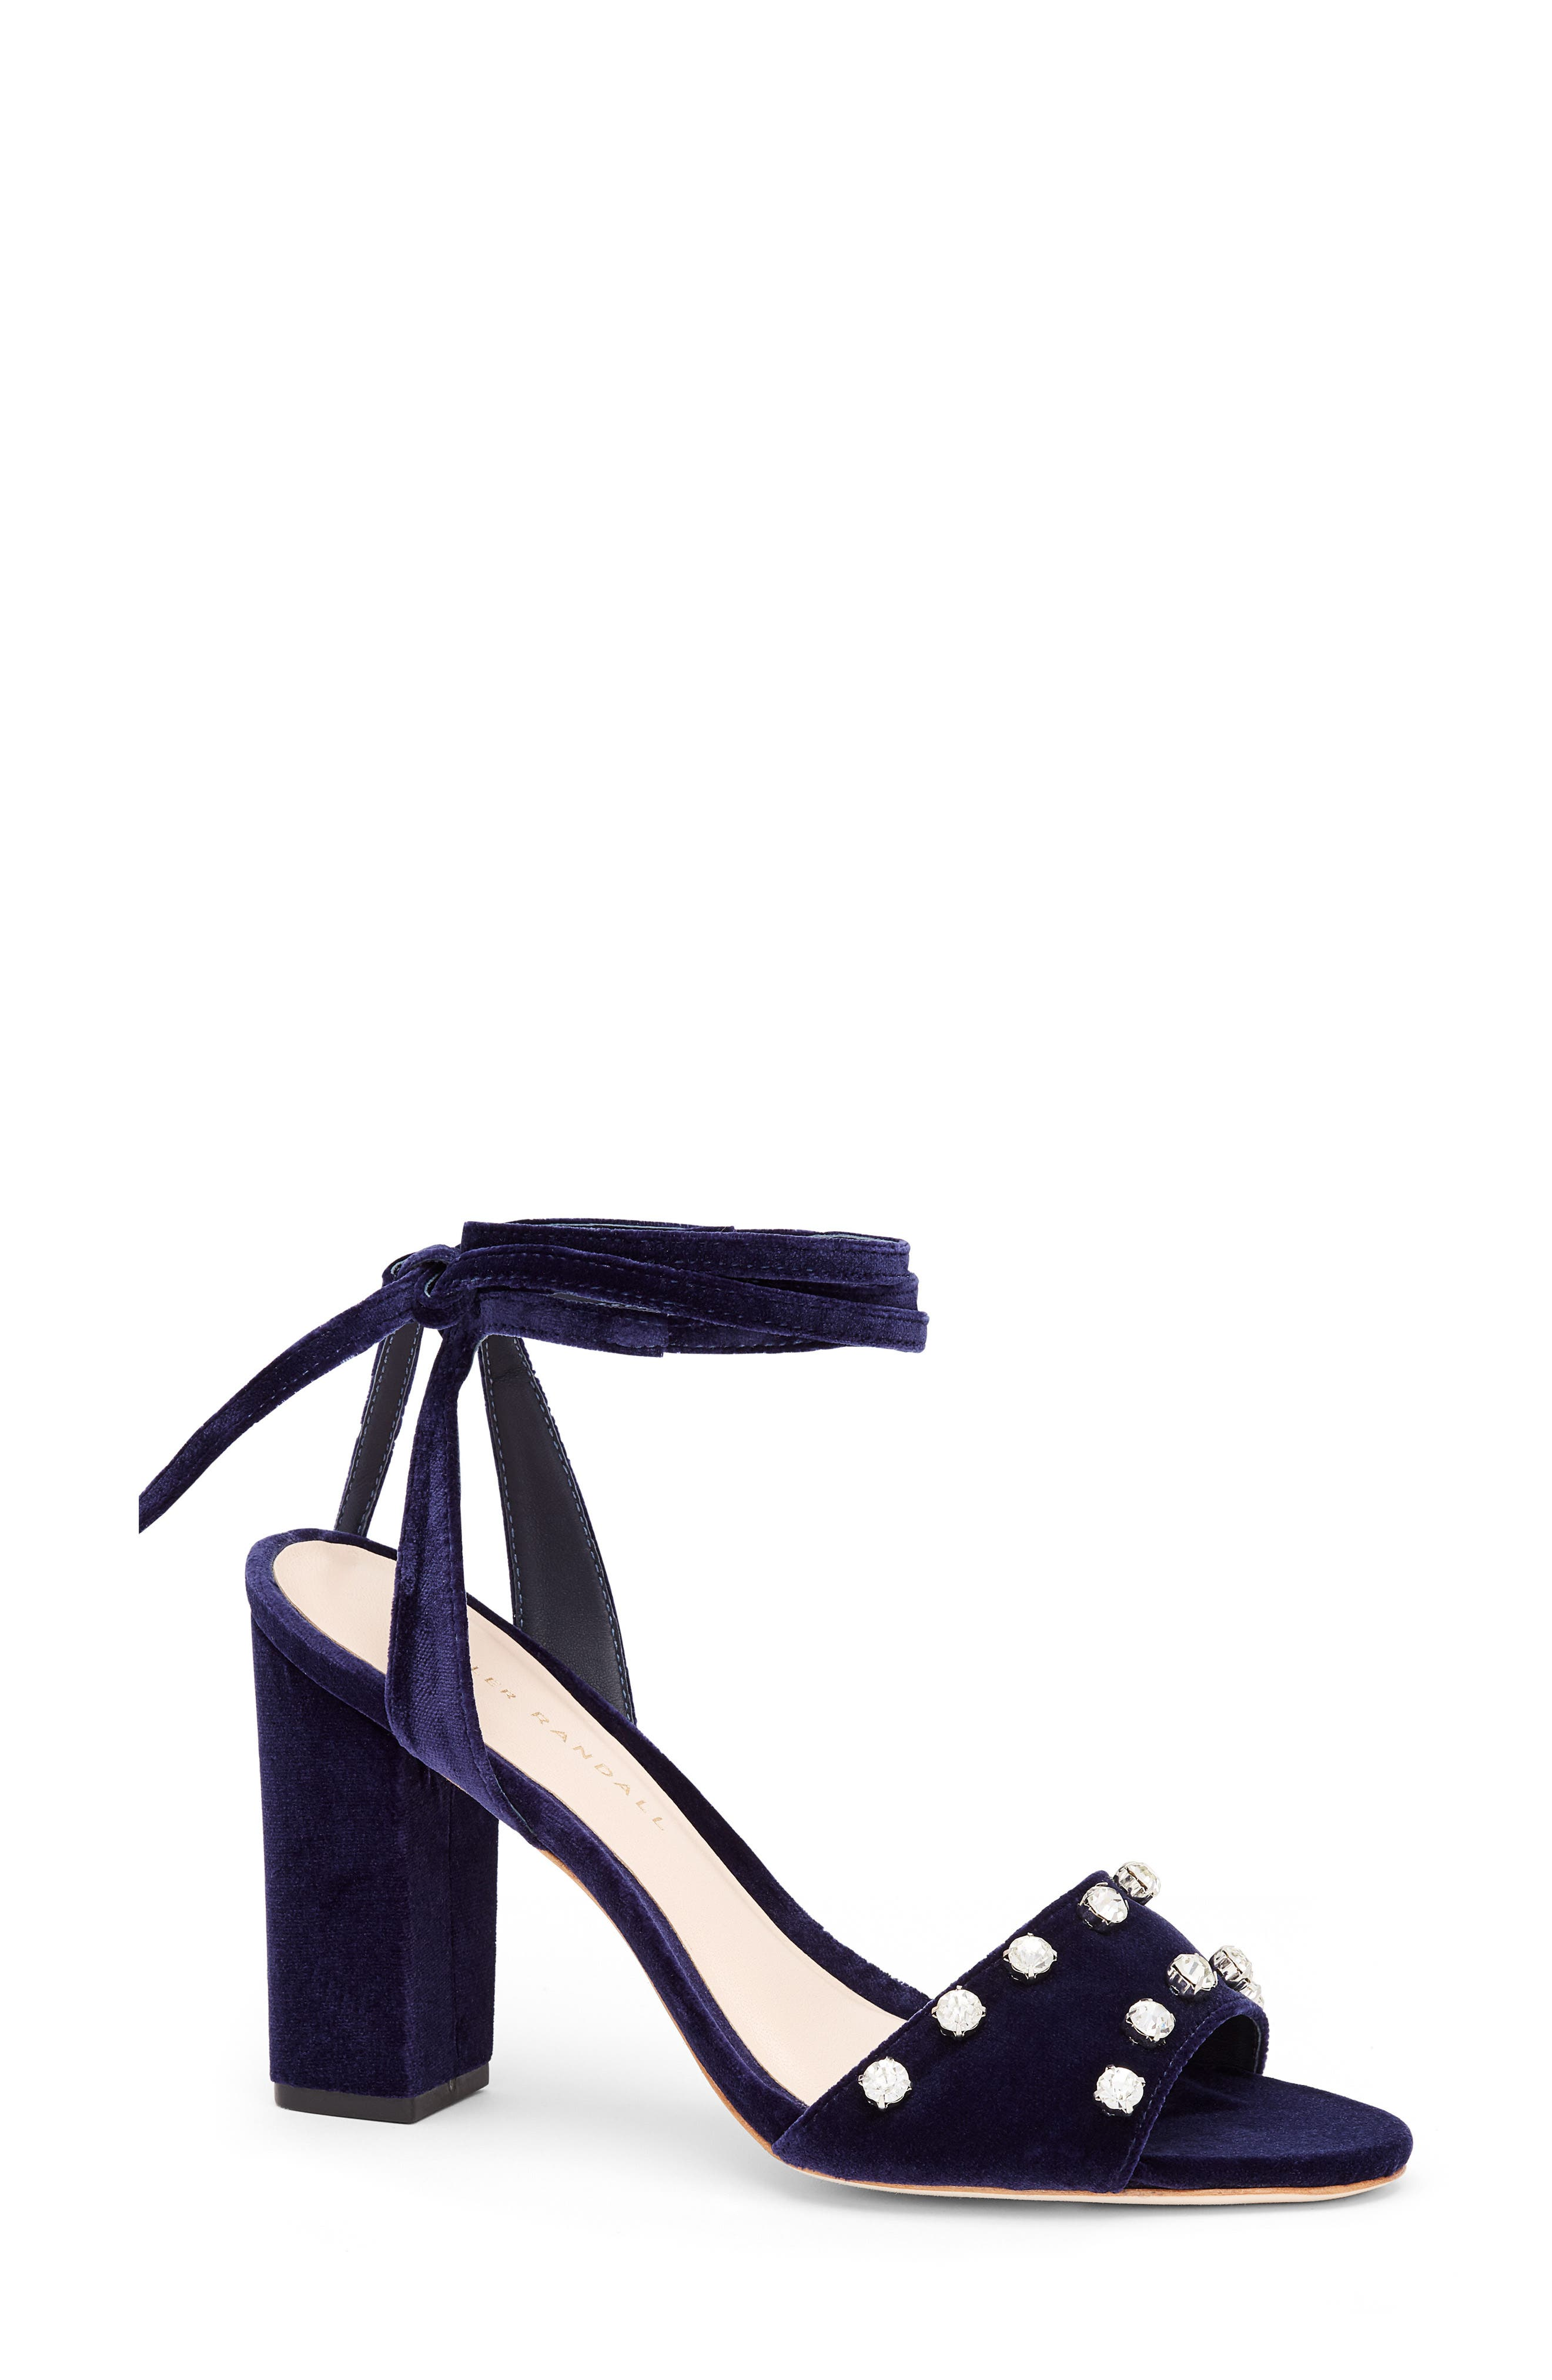 Main Image - Loeffler Randall Elayna Ankle Wrap Sandal (Women)